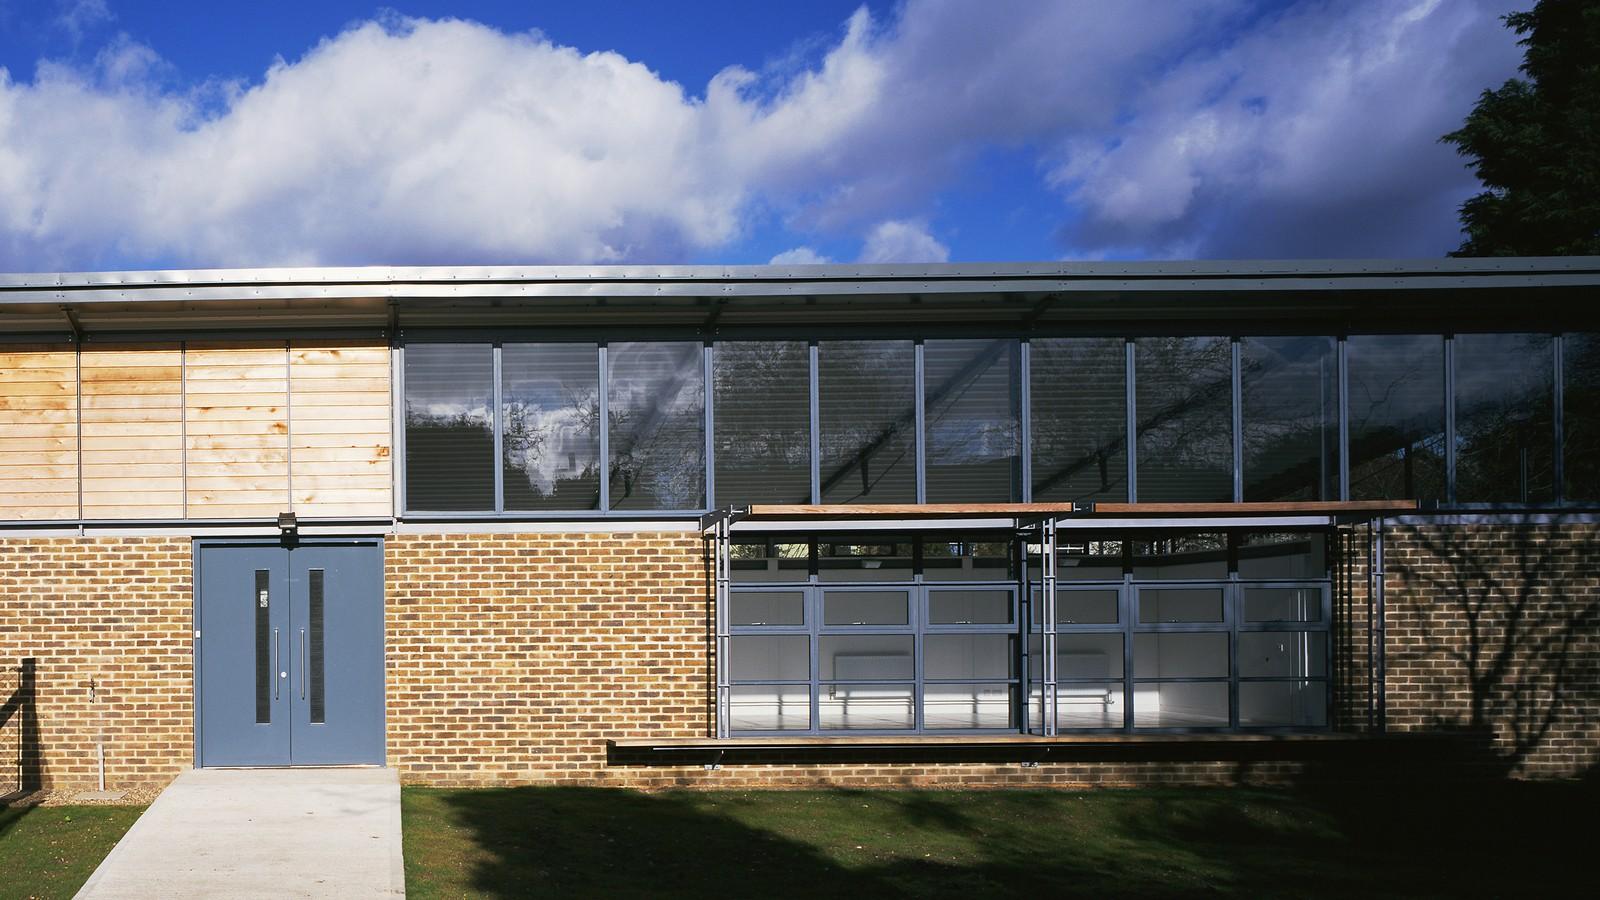 South Wimbledon District Guides 2